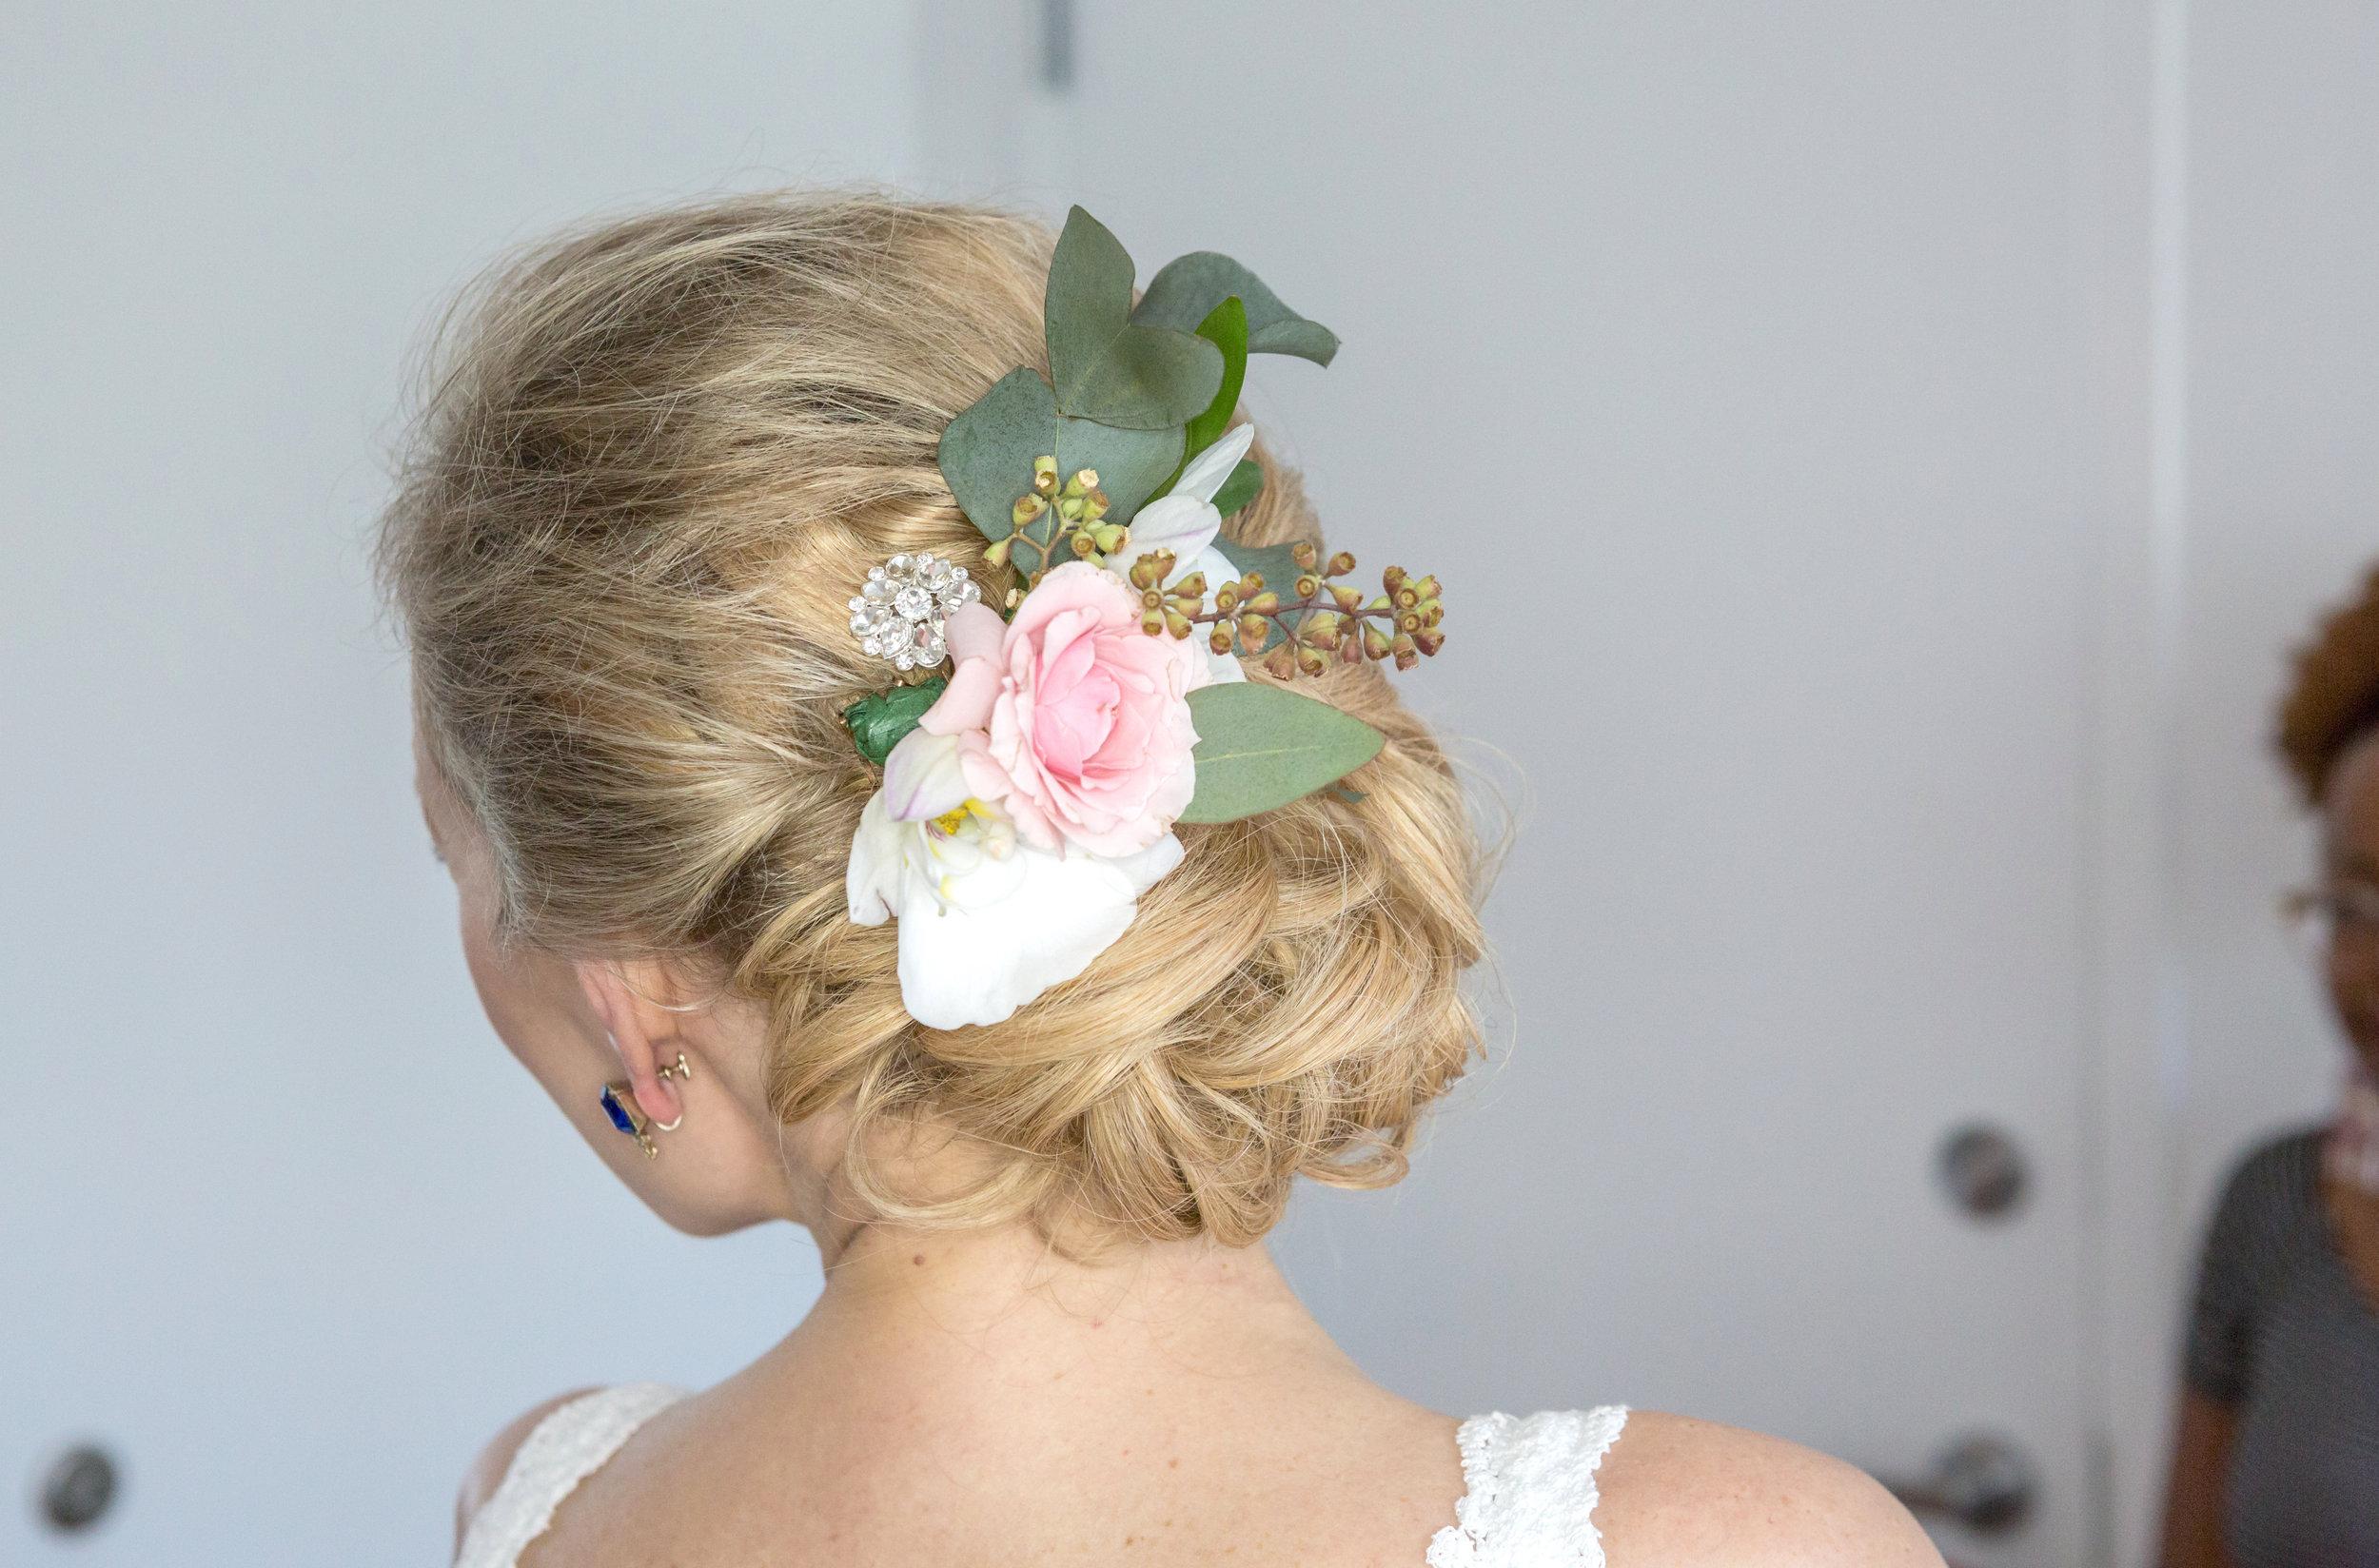 Vintage flowers for bride's hair at Key Biscayne wedding